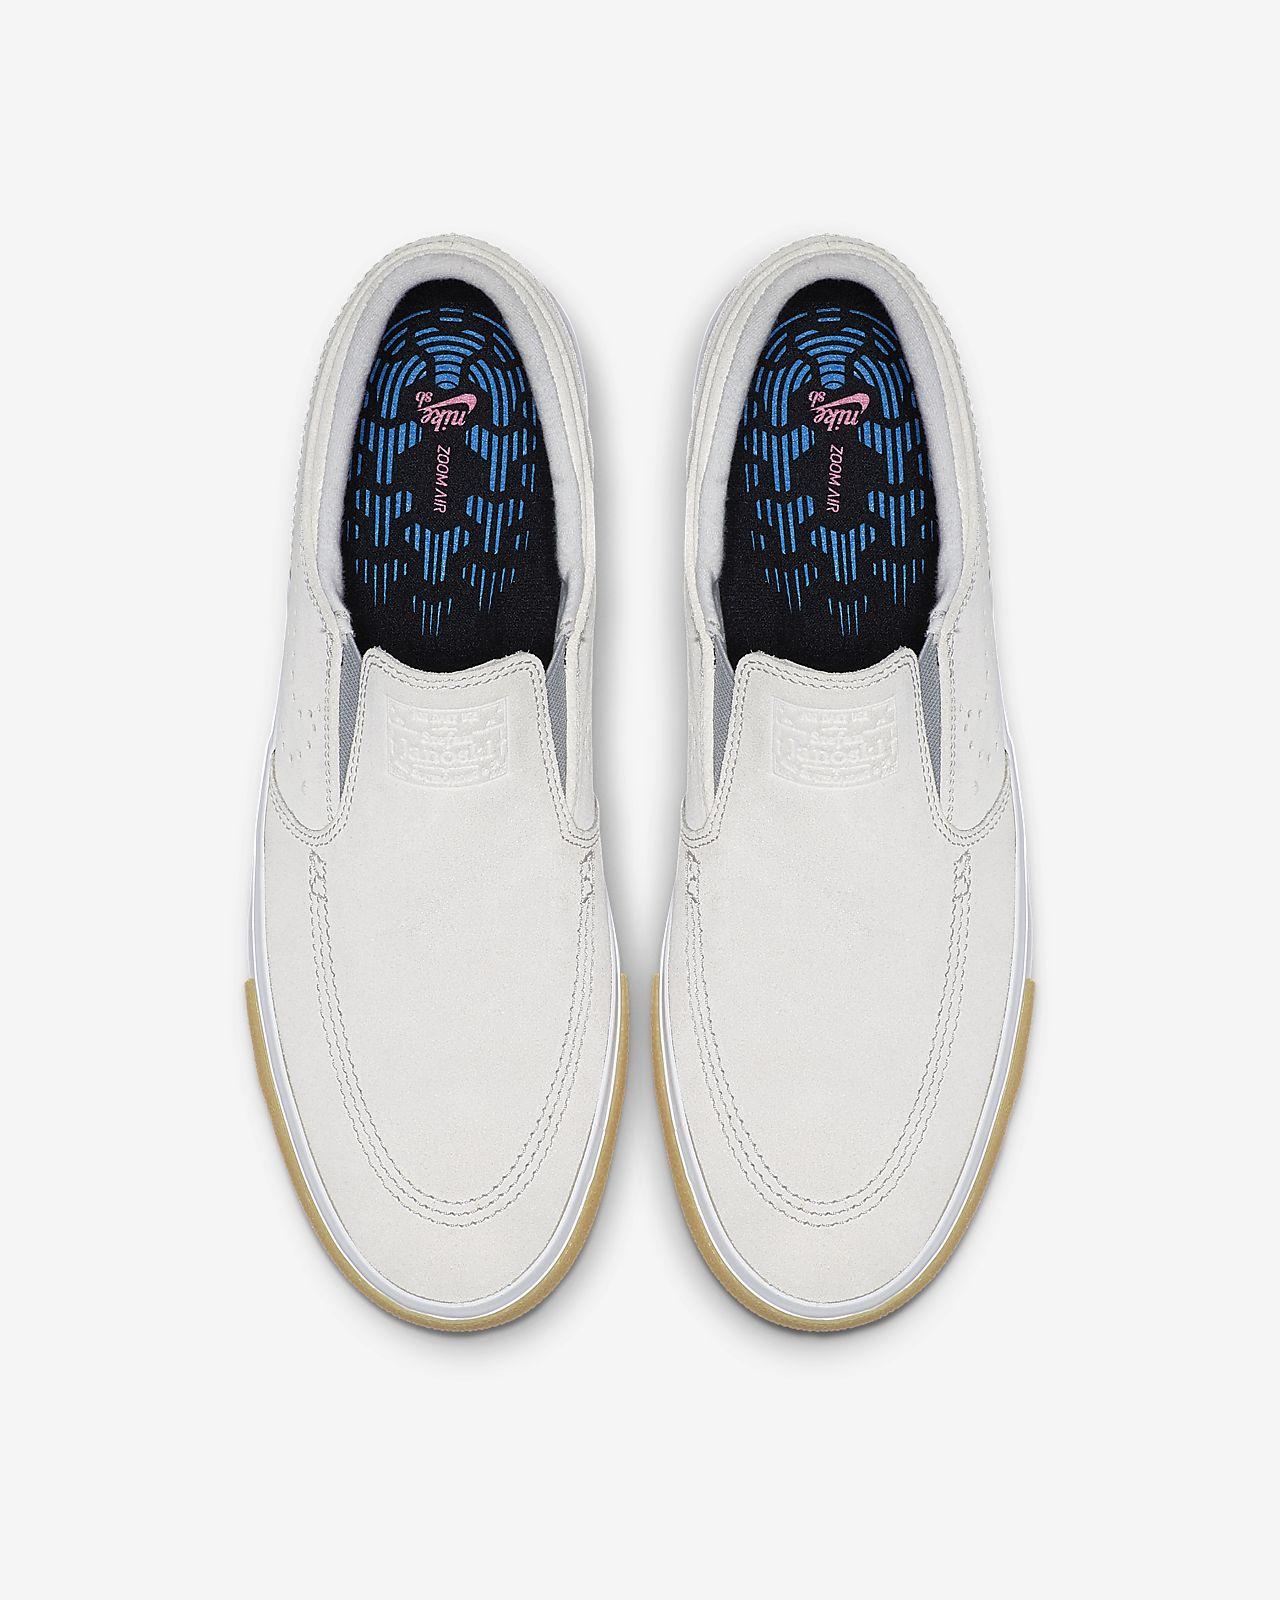 new style 02c0b 90465 ... Nike SB Zoom Stefan Janoski Slip RM SE Skate Shoe